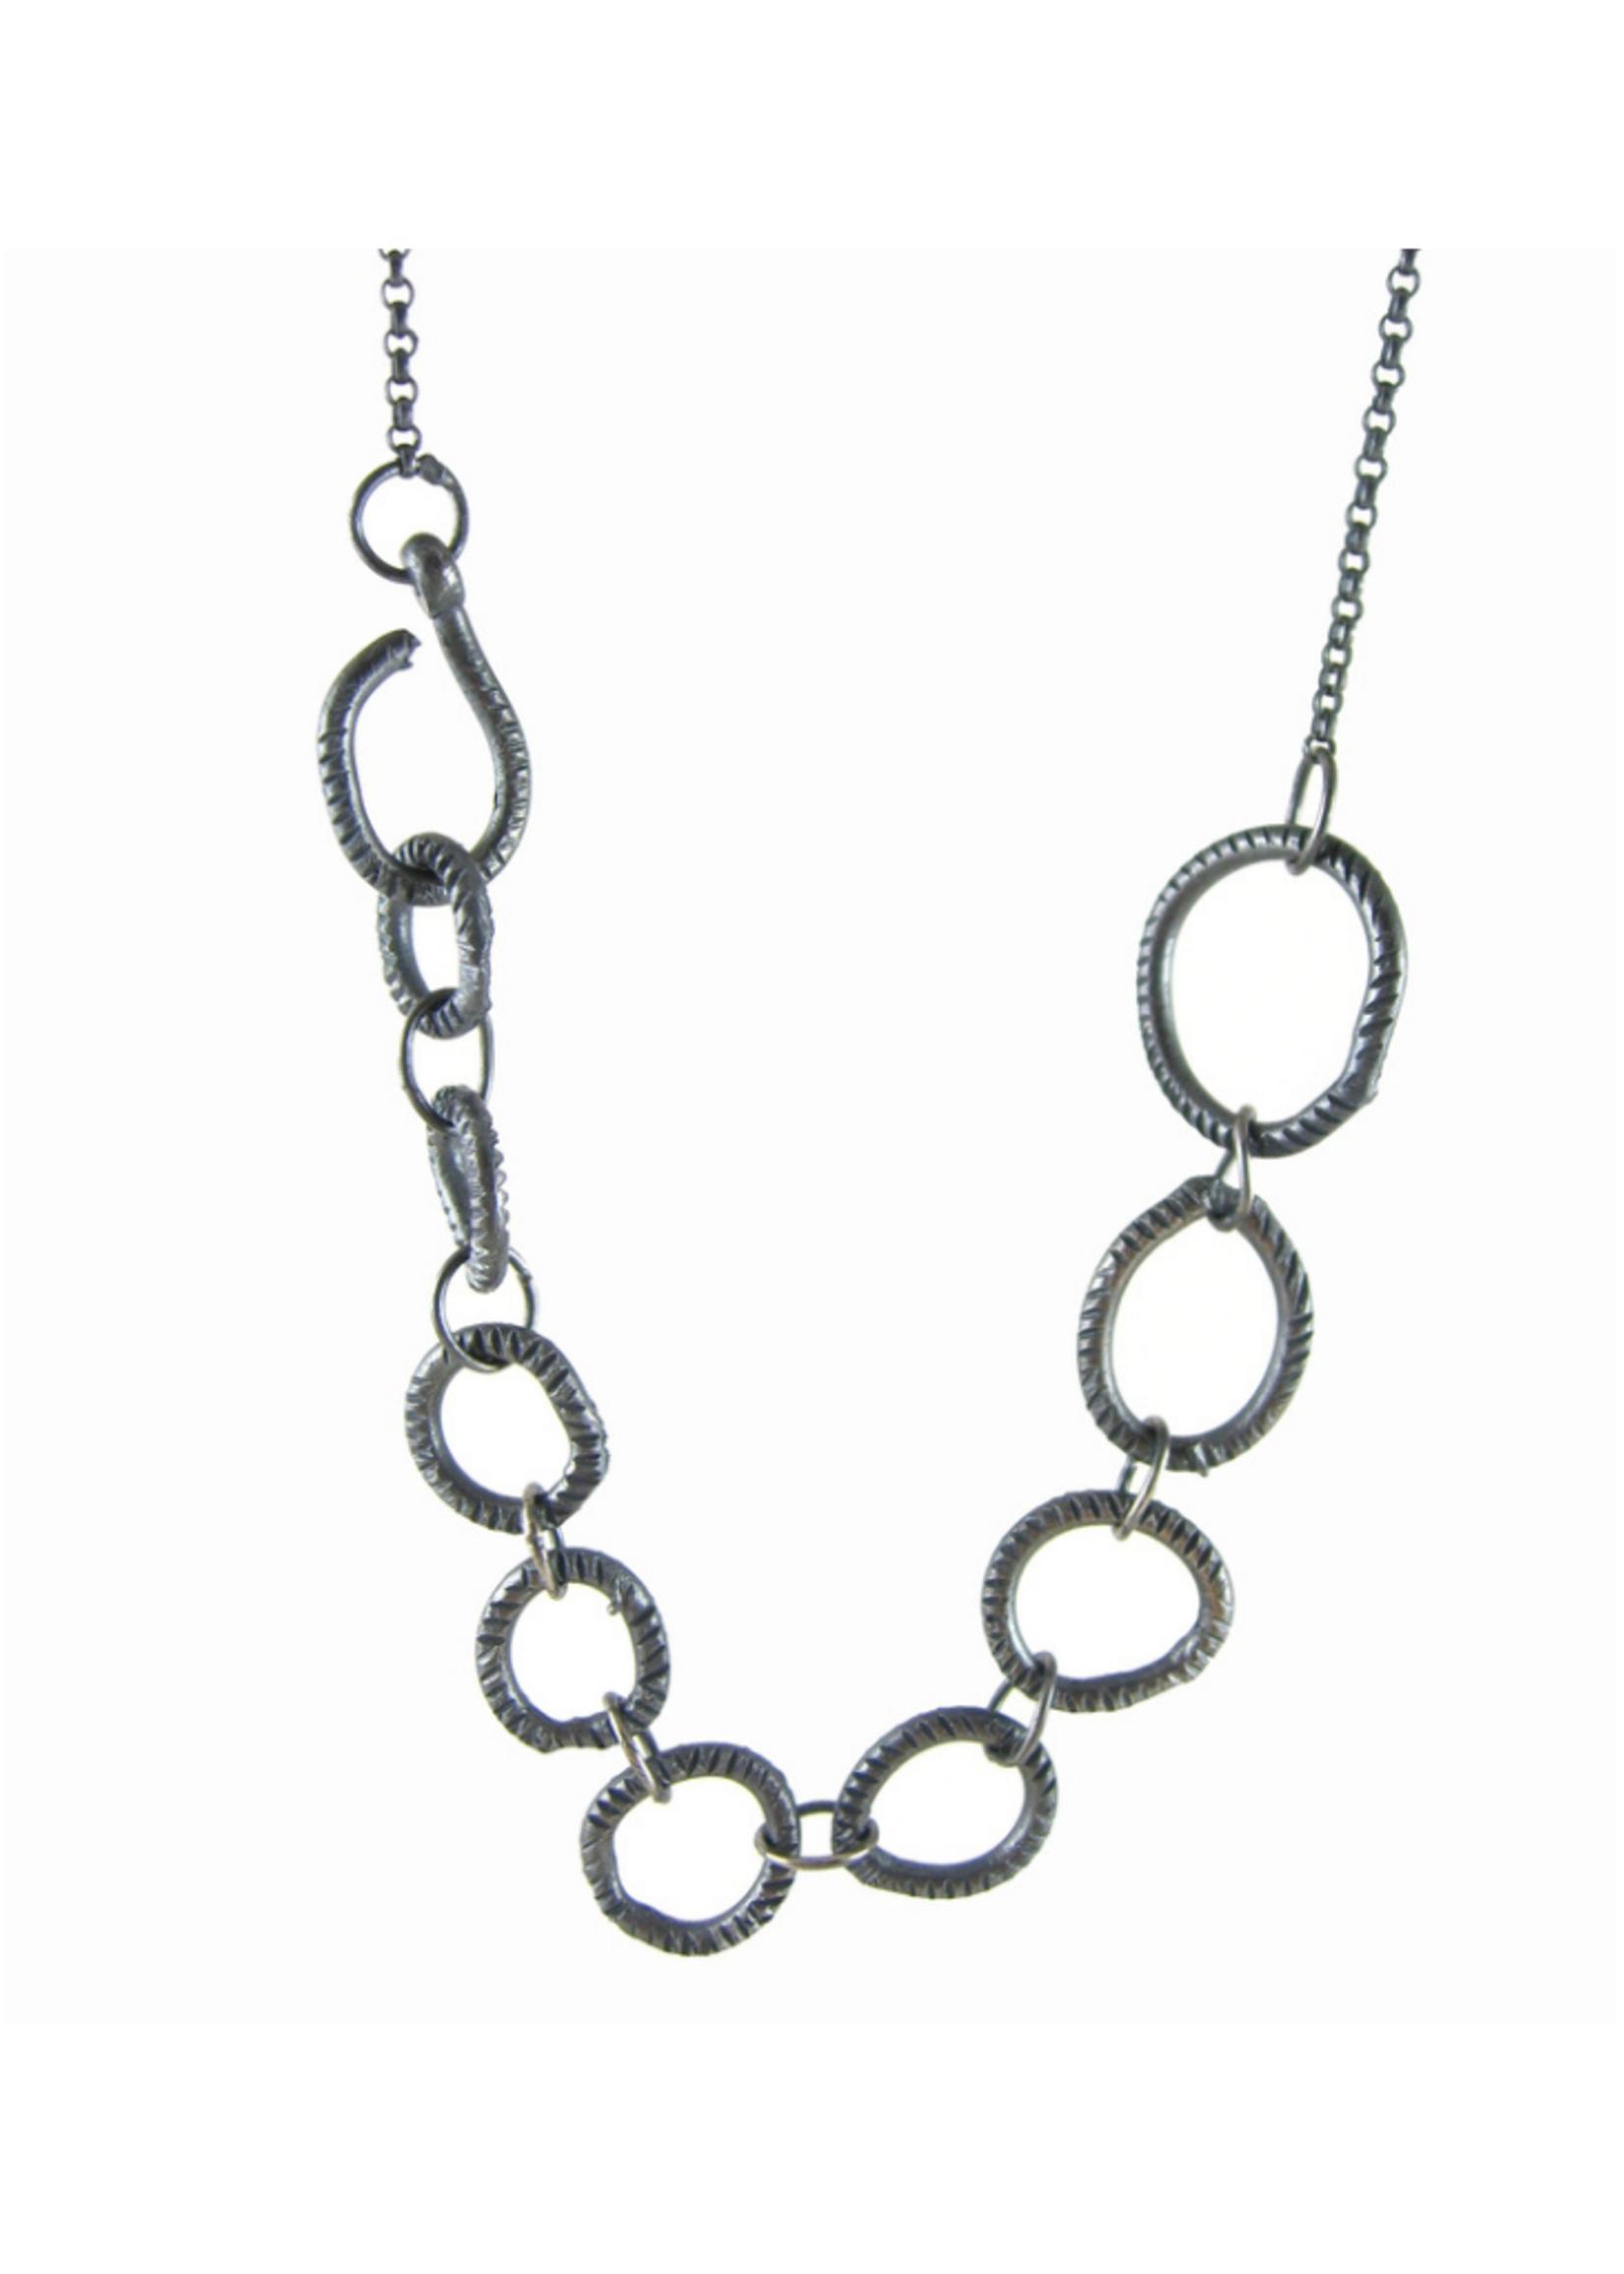 Sharon Z Jewelry Open Stone Necklace OX Silver